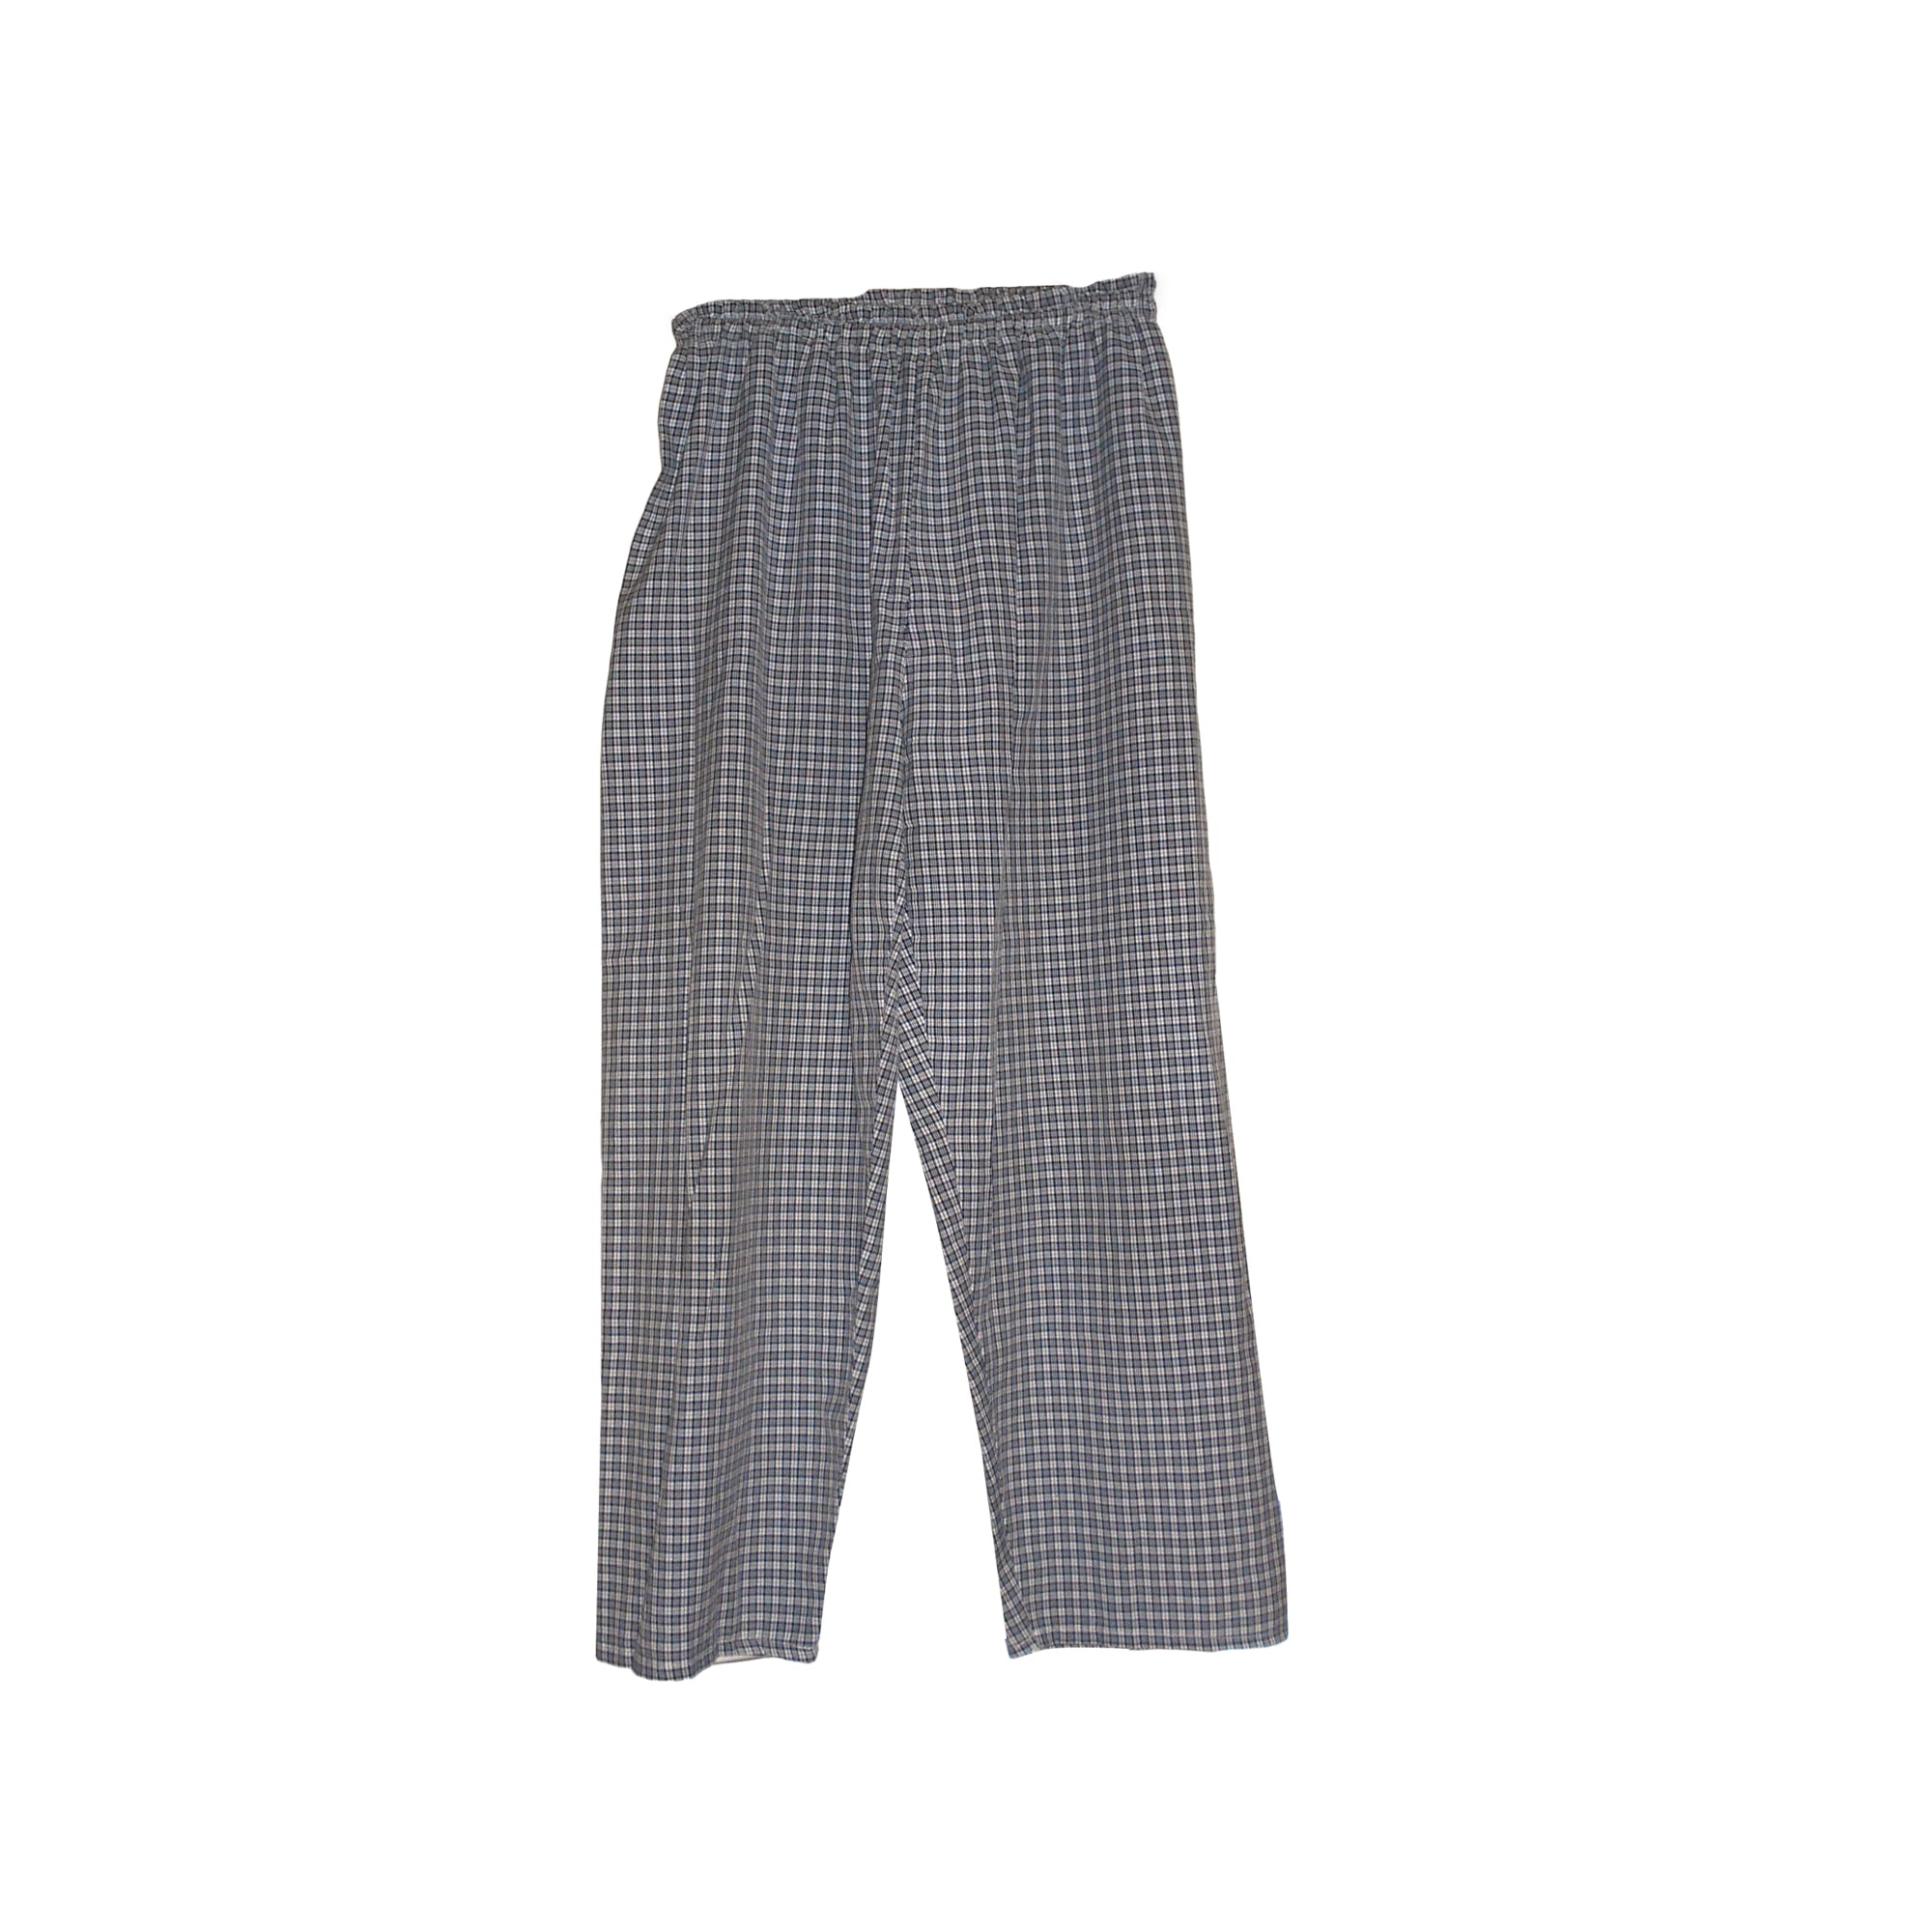 Pantalon large VINTAGE Gris, anthracite